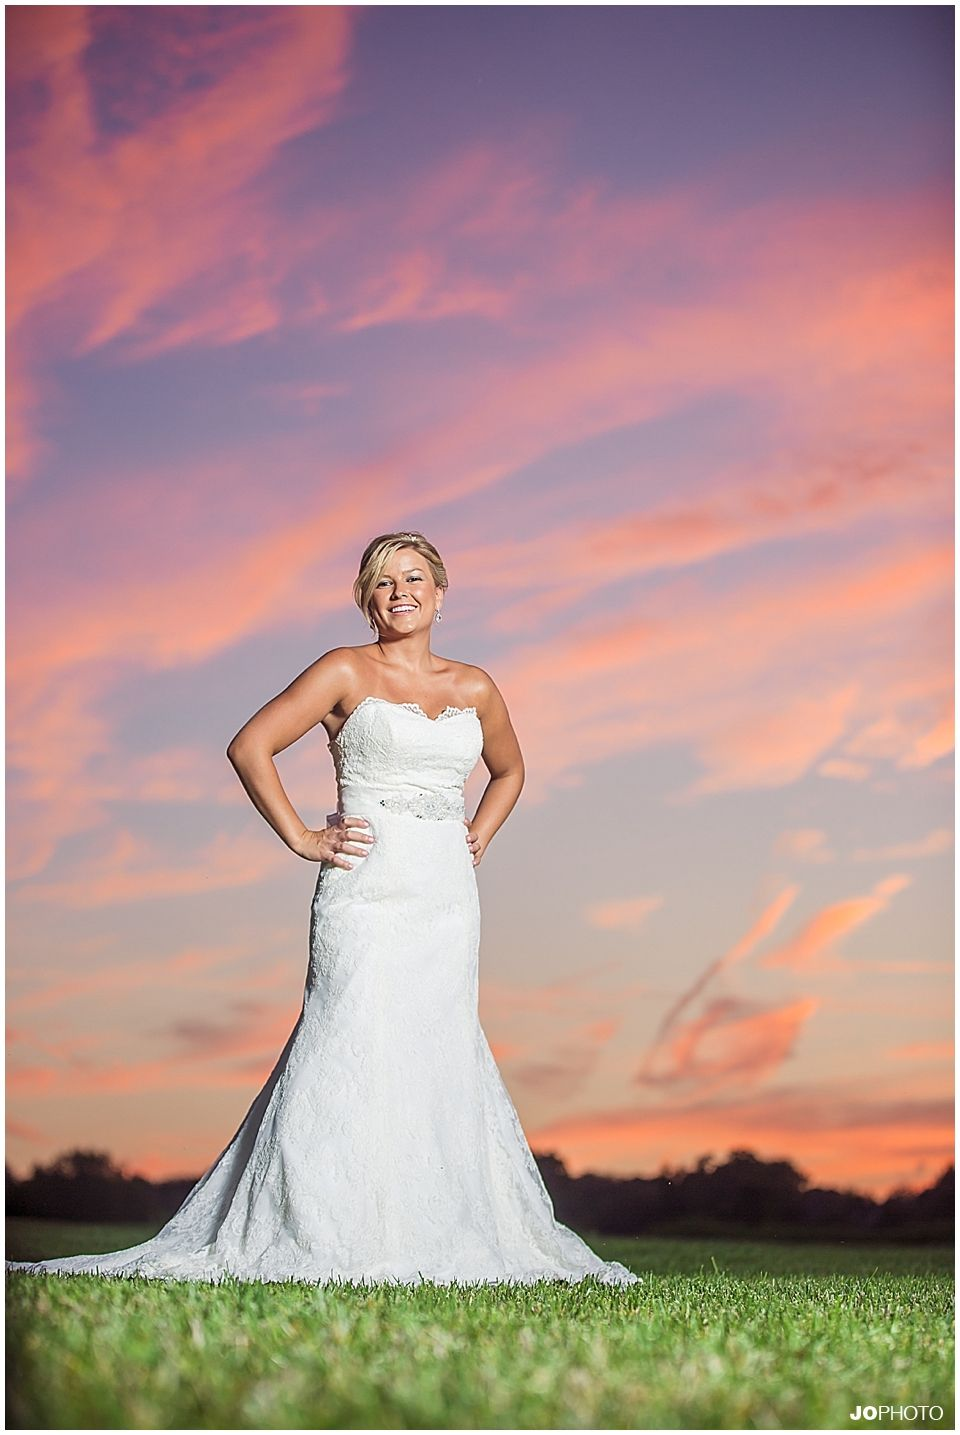 Bridgemore Wedding - bridal portraits in Knoxville TN. Beautiful ...